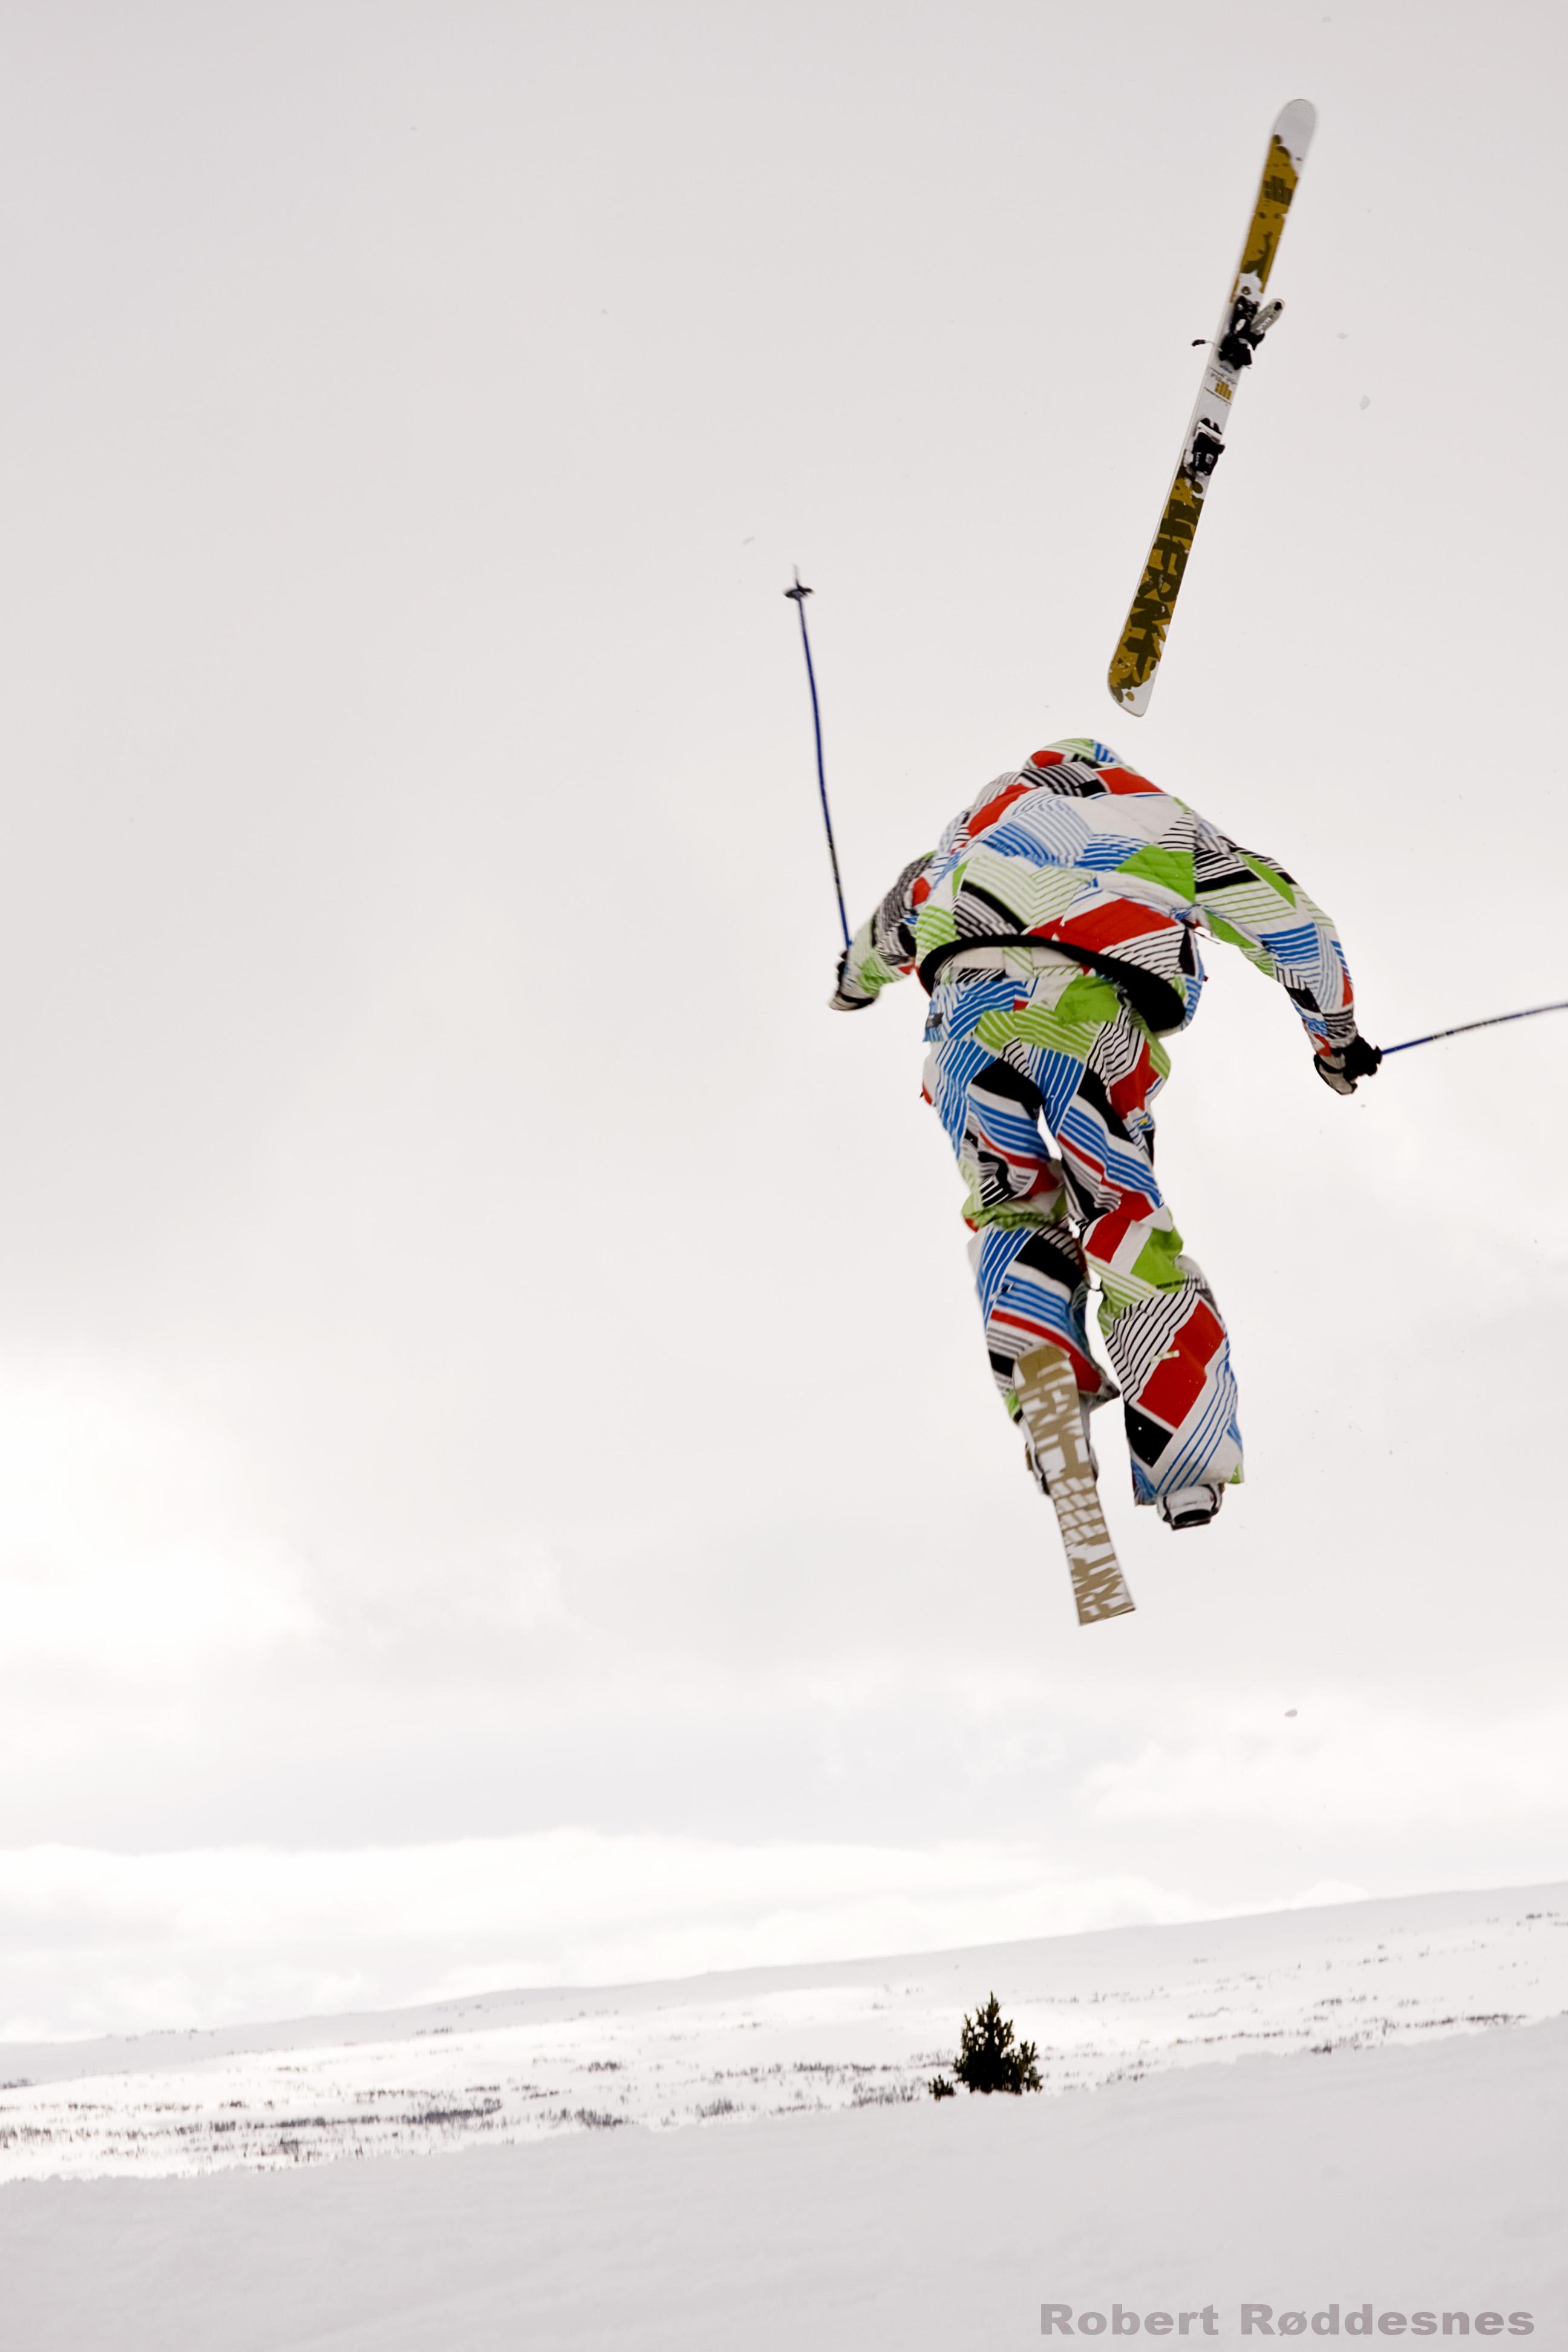 """That air stole my ski!"""